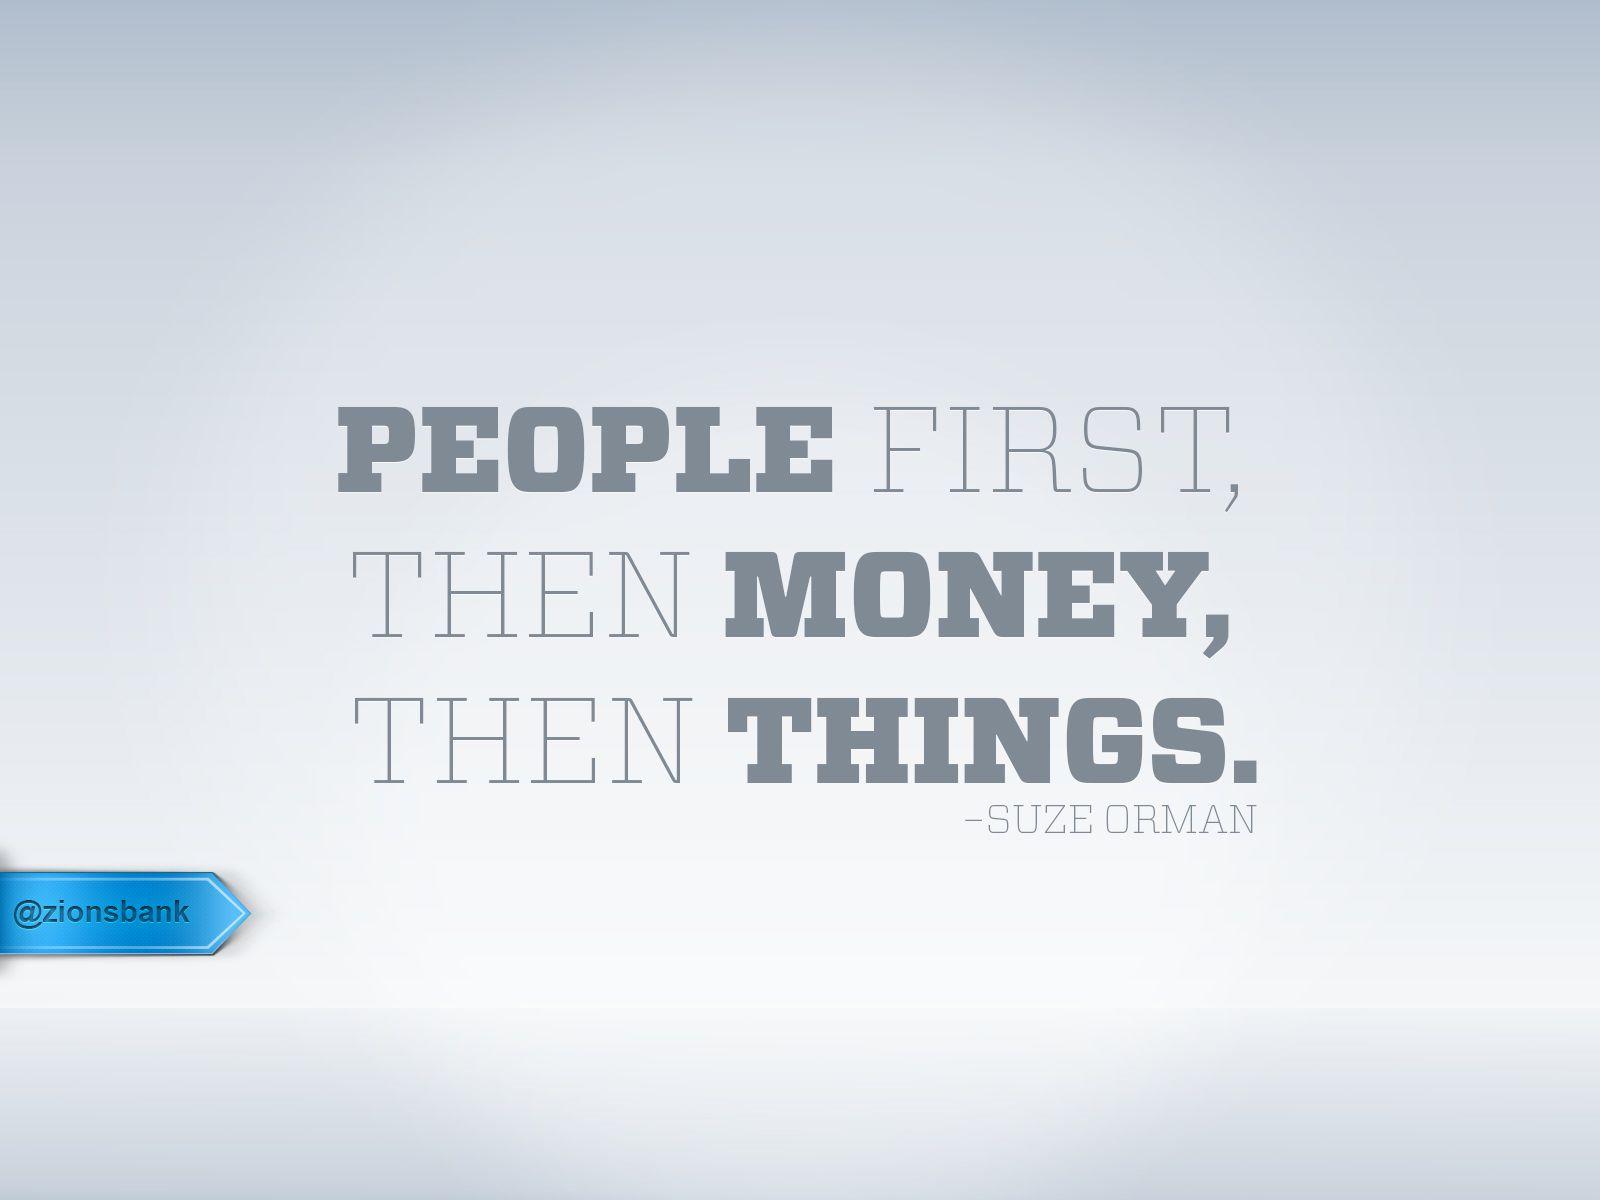 Money Helps Quotes Baffabaacfdcfdf